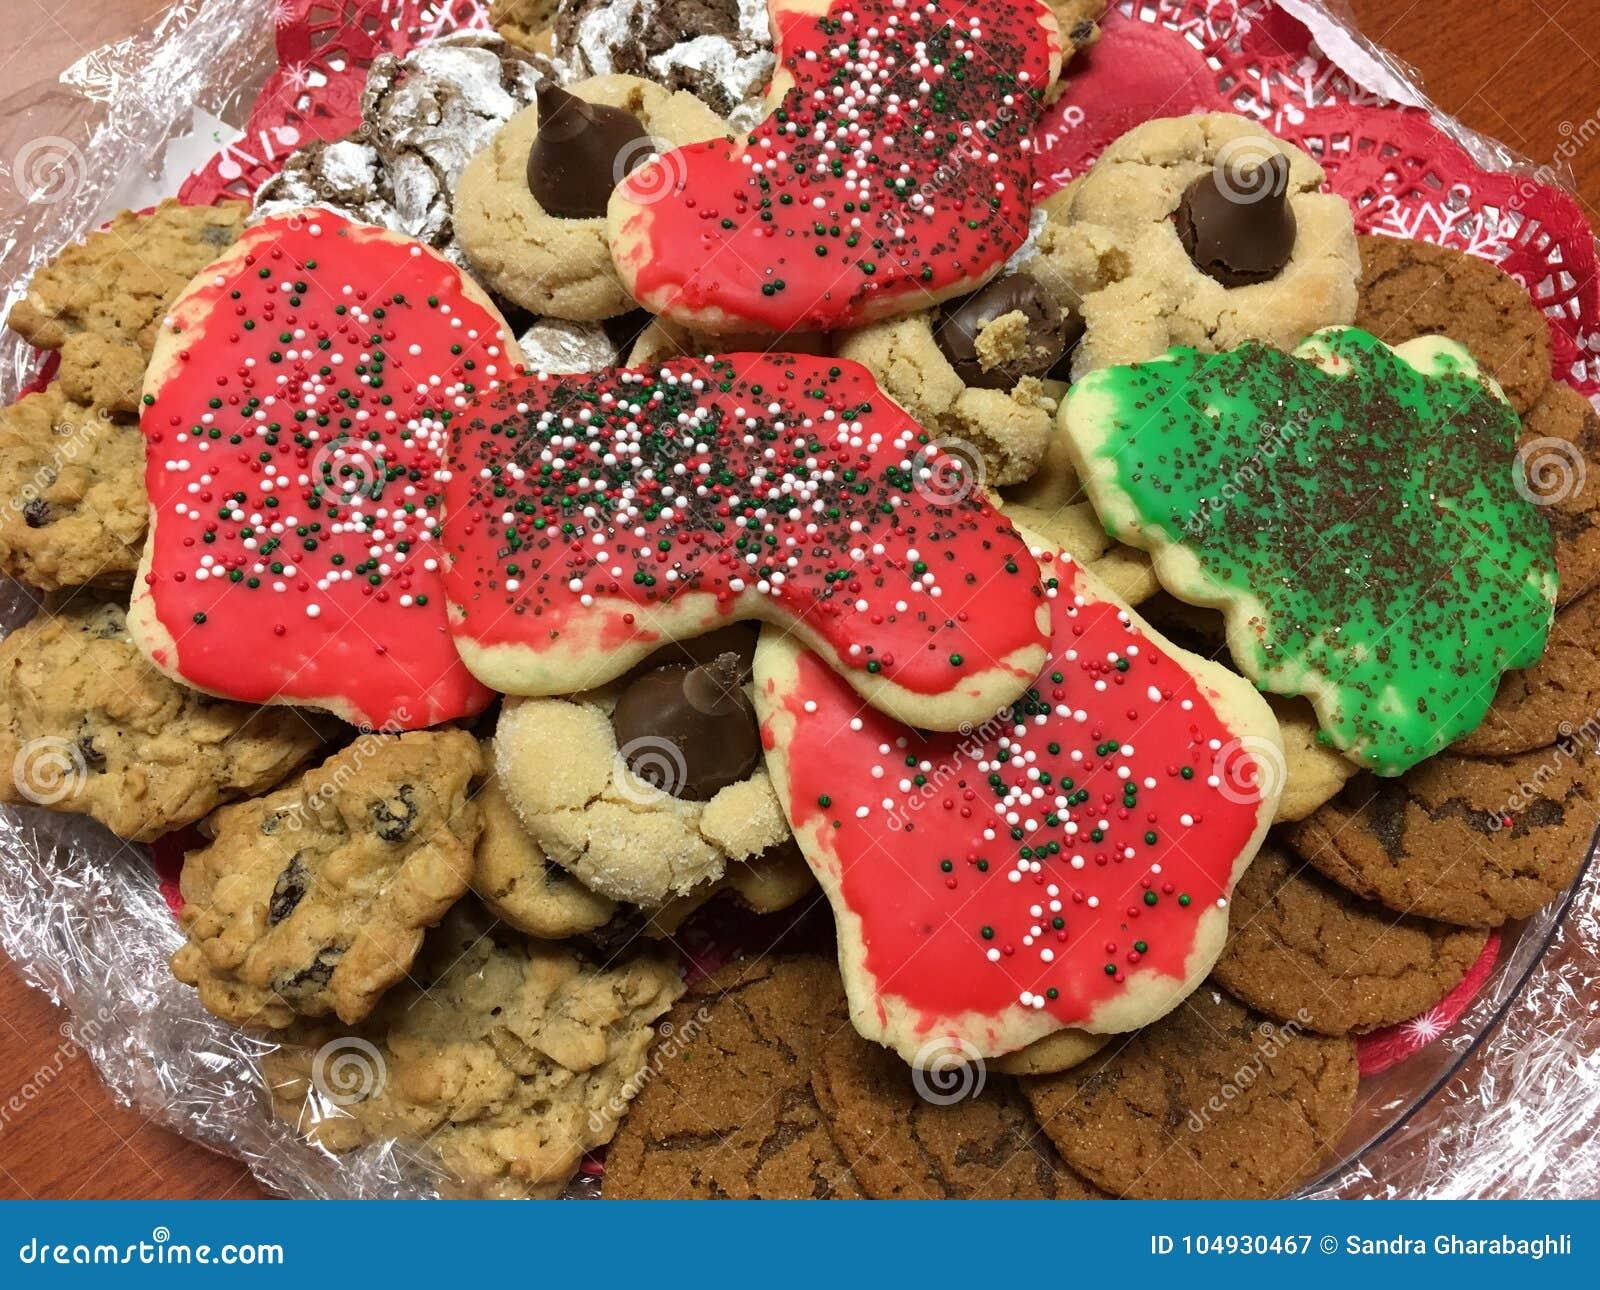 Assorted Christmas Cookies stock image. Image of oatmeal - 104930467